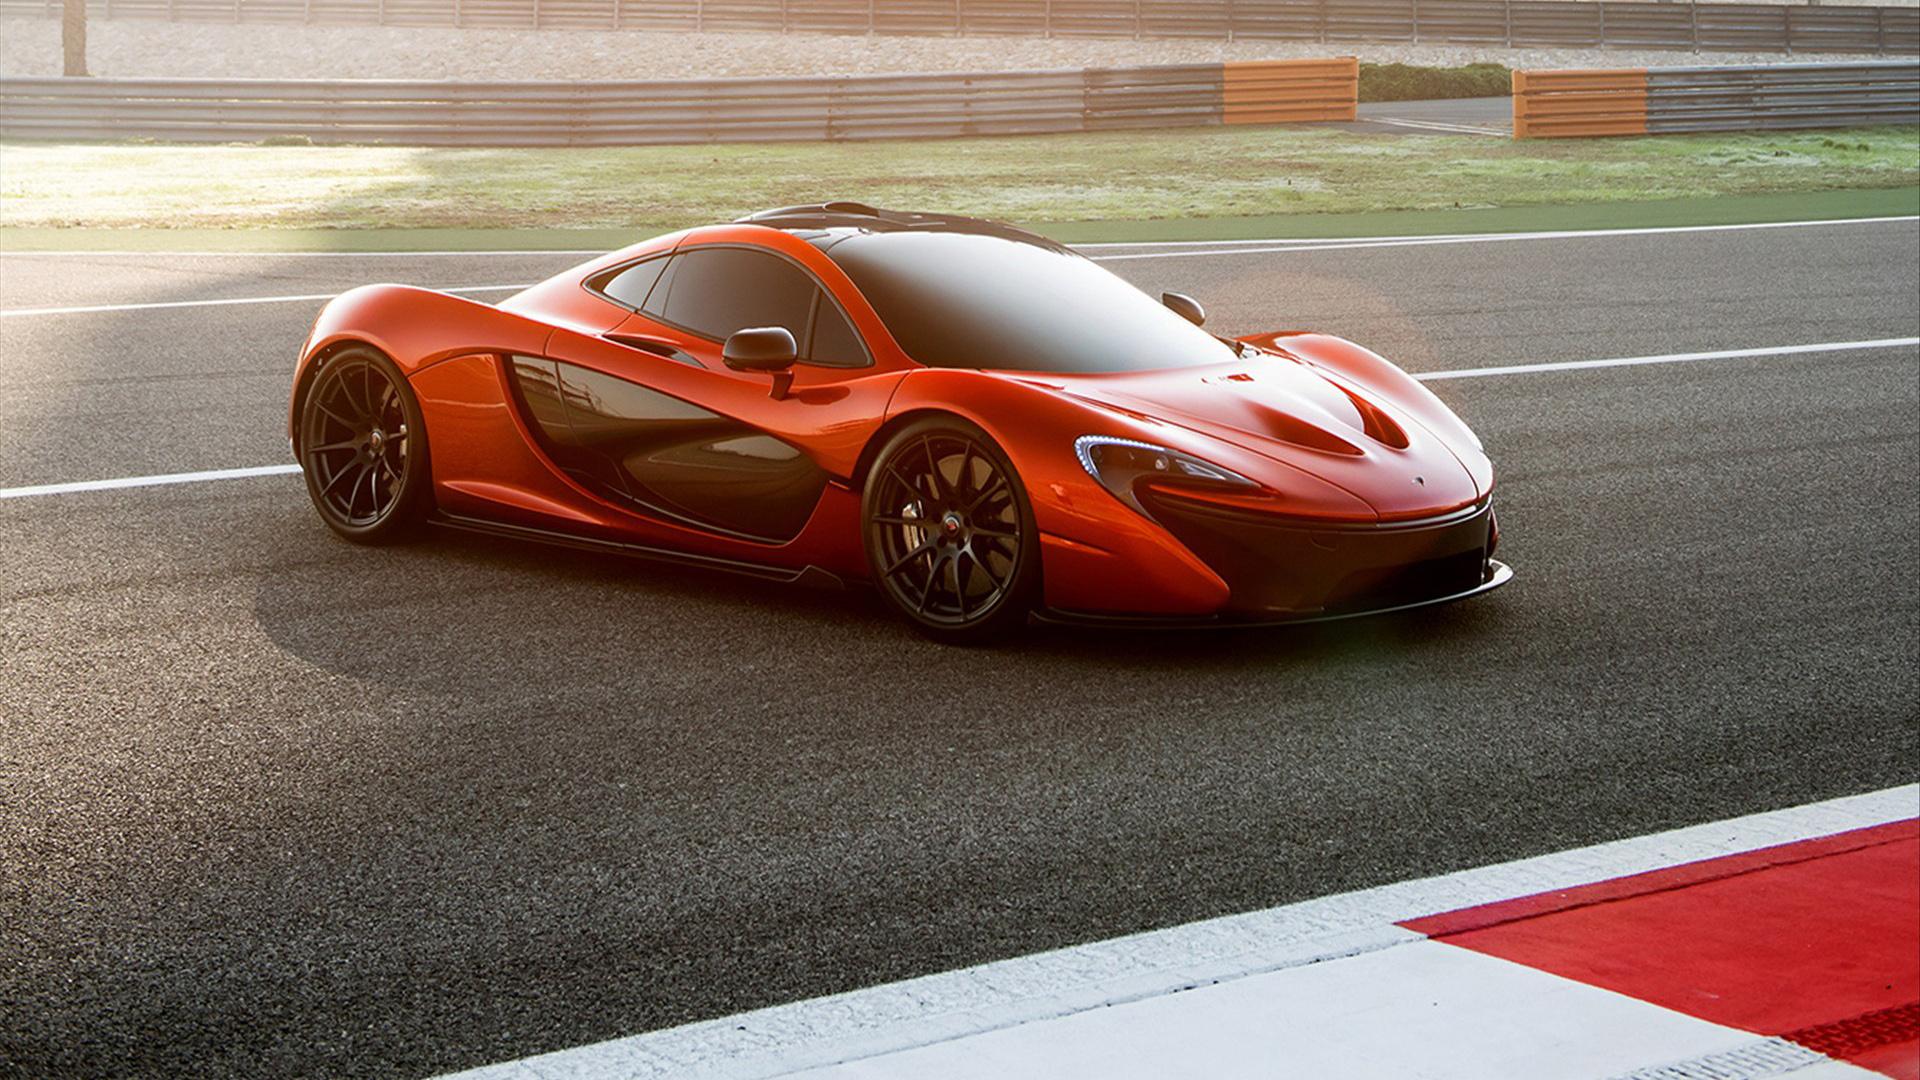 McLaren P1 2014 Wallpaper | HD Car Wallpapers | ID #3315